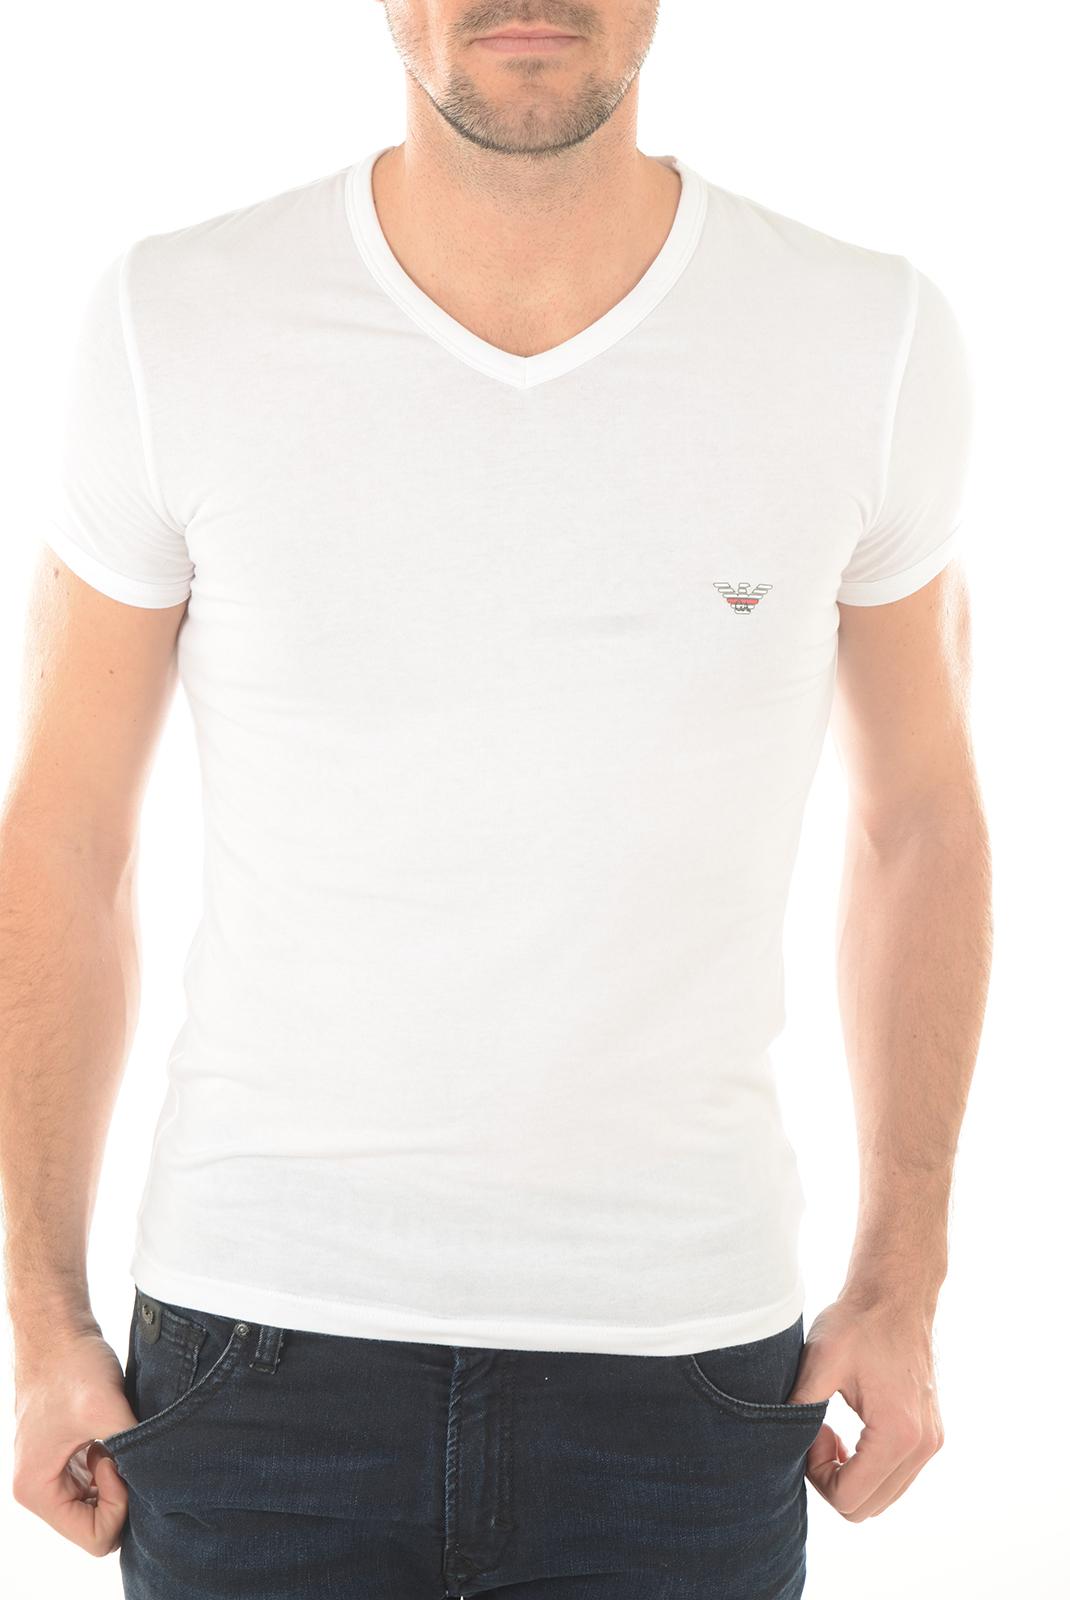 T-S manches courtes  Emporio armani 110810 6P725 10 blanc